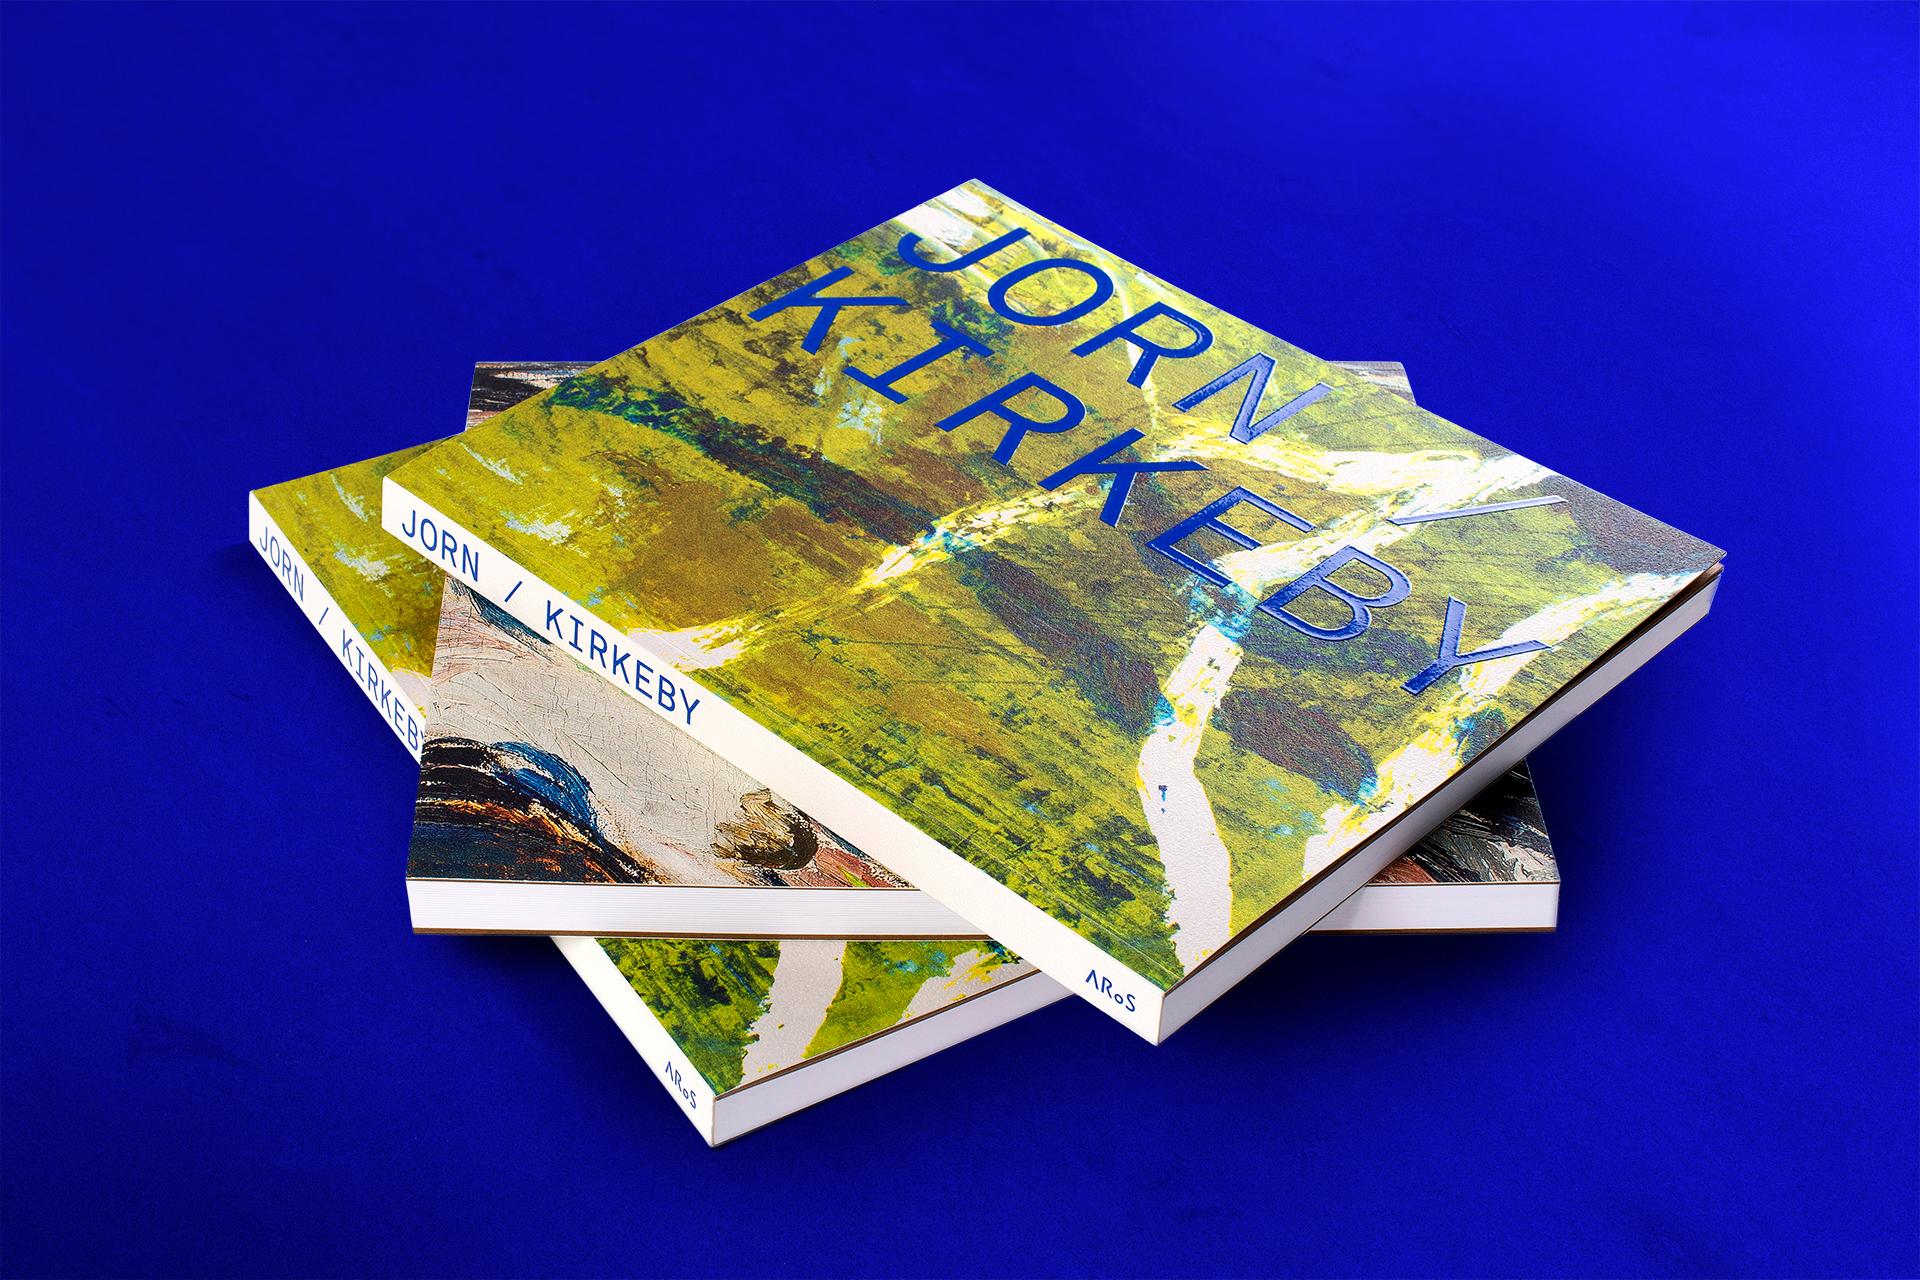 aros-jorn-kirkeby-book-cover-01-ian-bennett